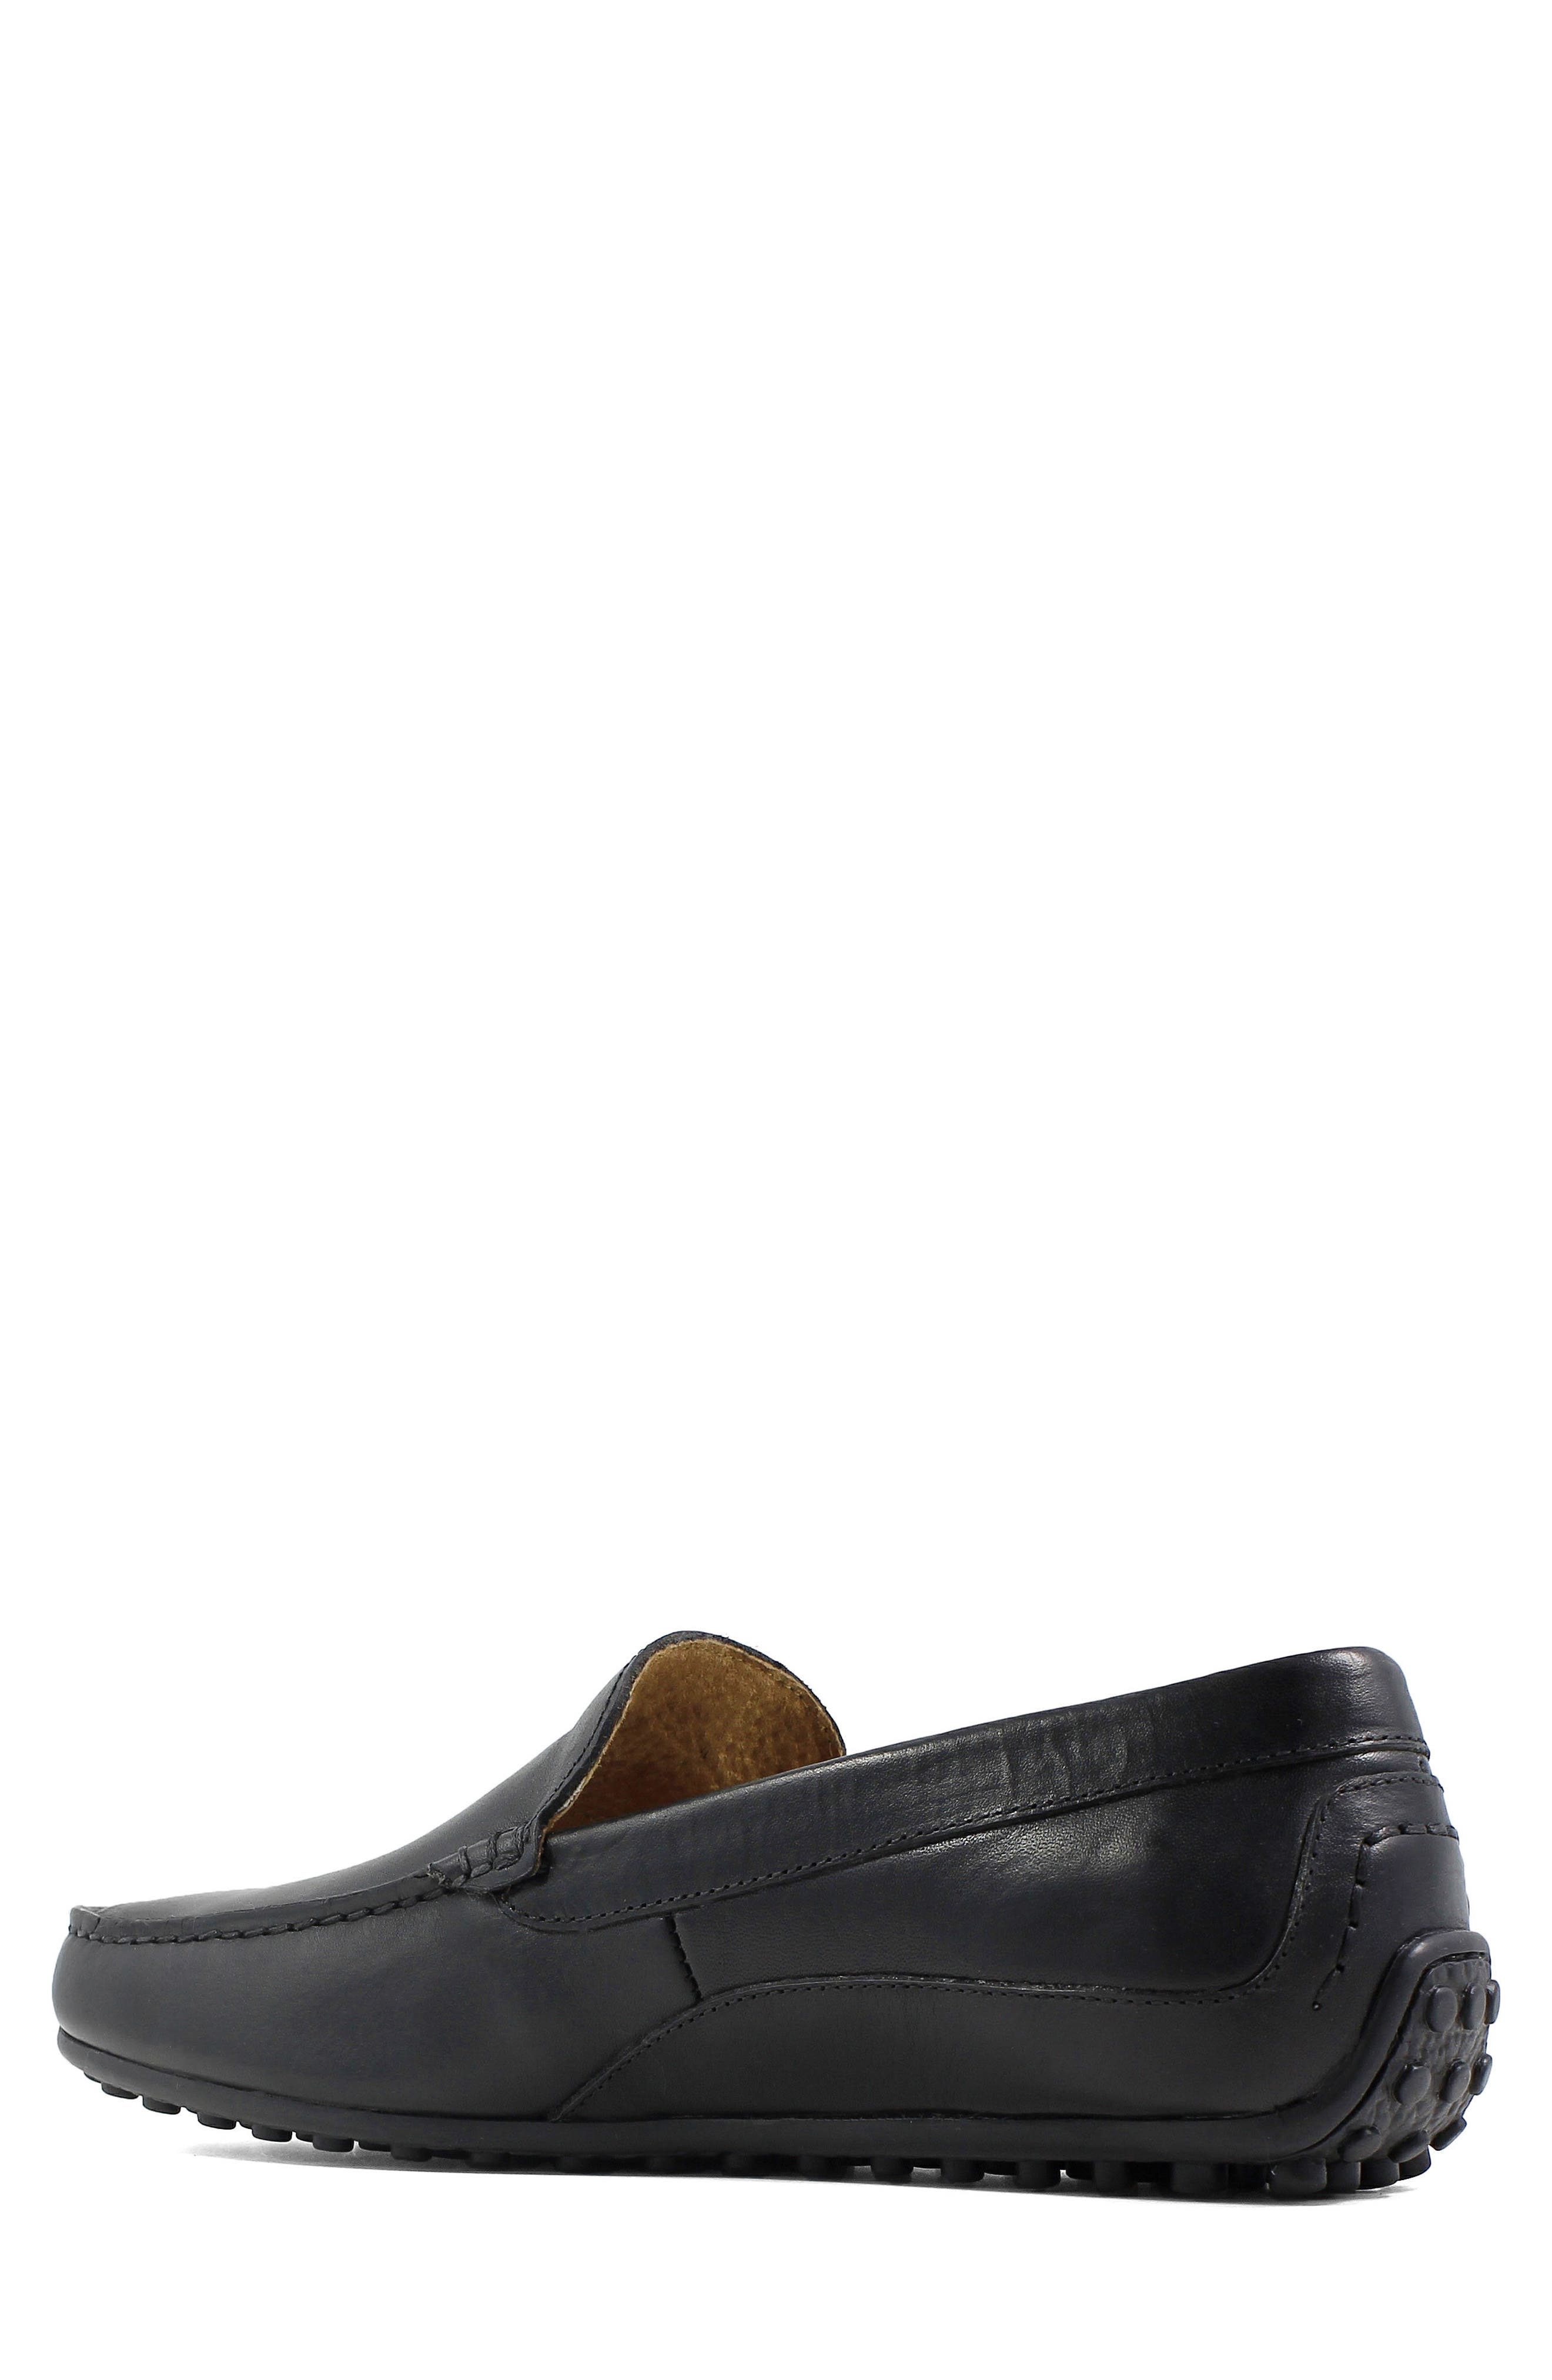 FLORSHEIM, Oval Driving Shoe, Alternate thumbnail 2, color, BLACK LEATHER